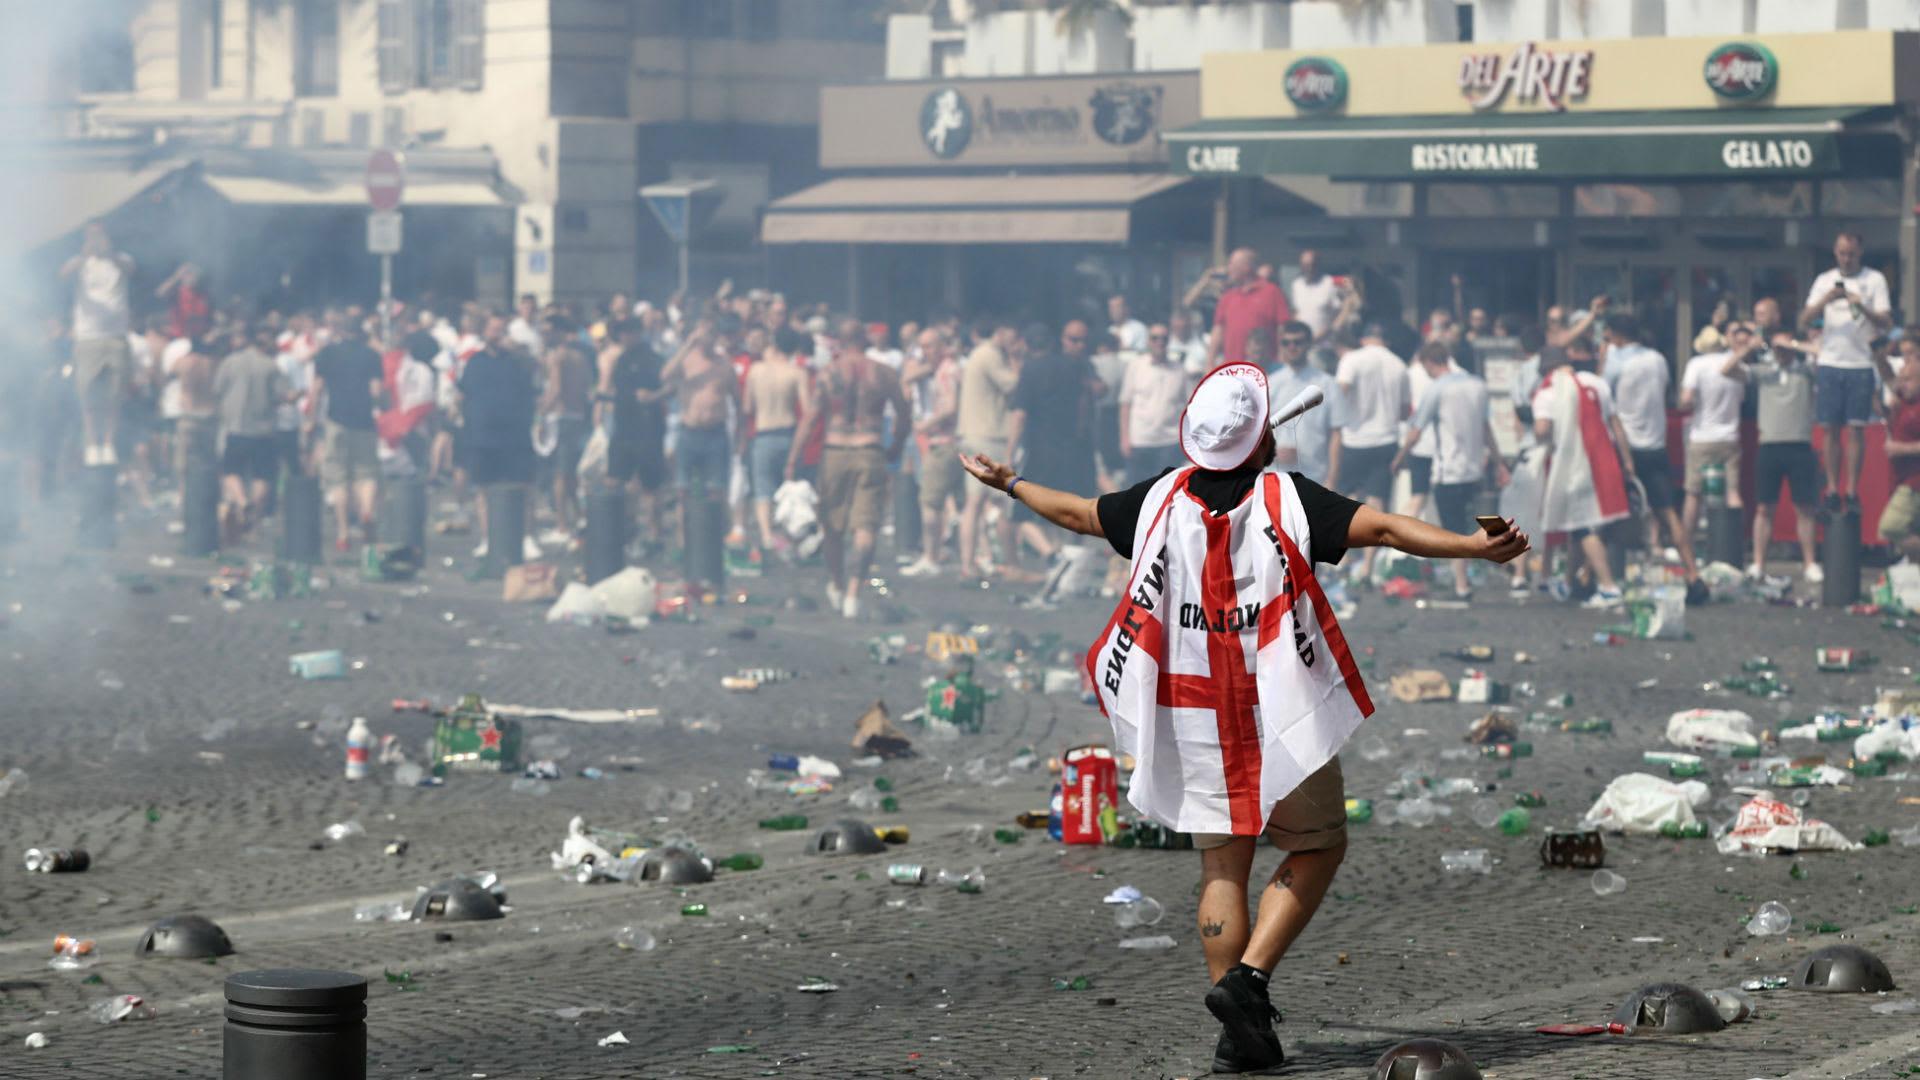 History Of Football Hooliganism In The United Kingdom